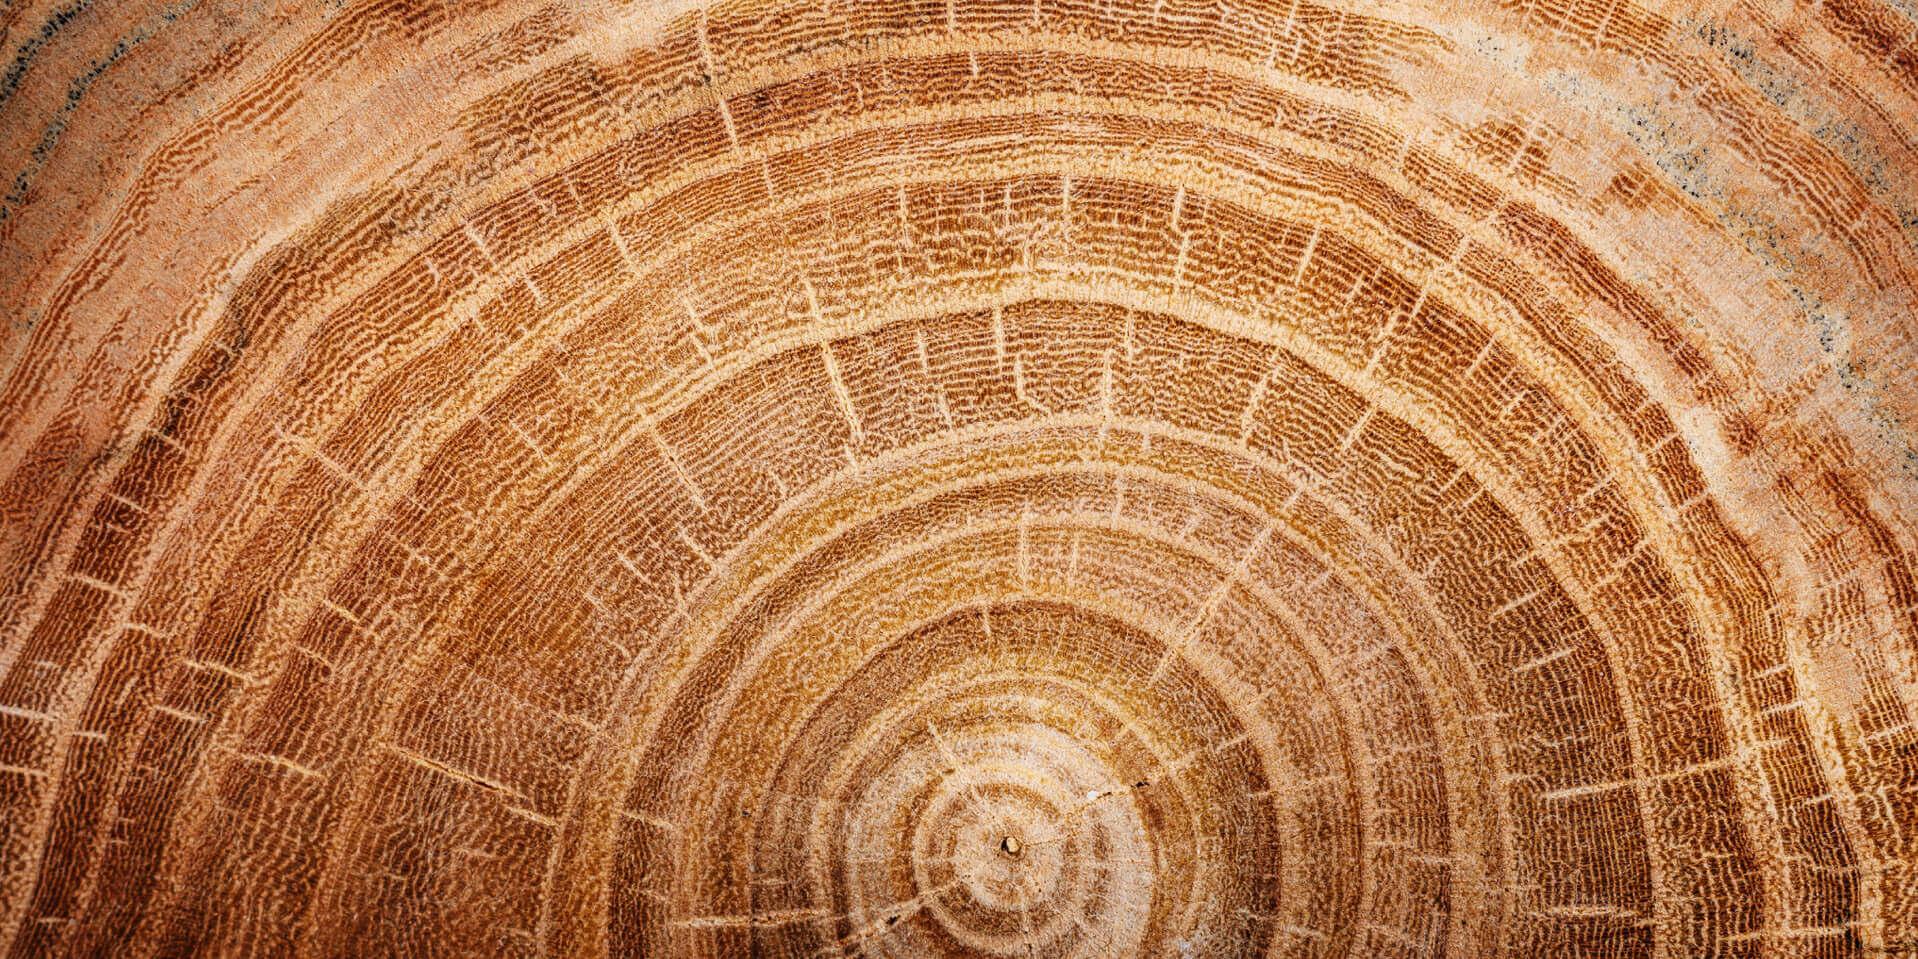 blond wood harvest essential oil